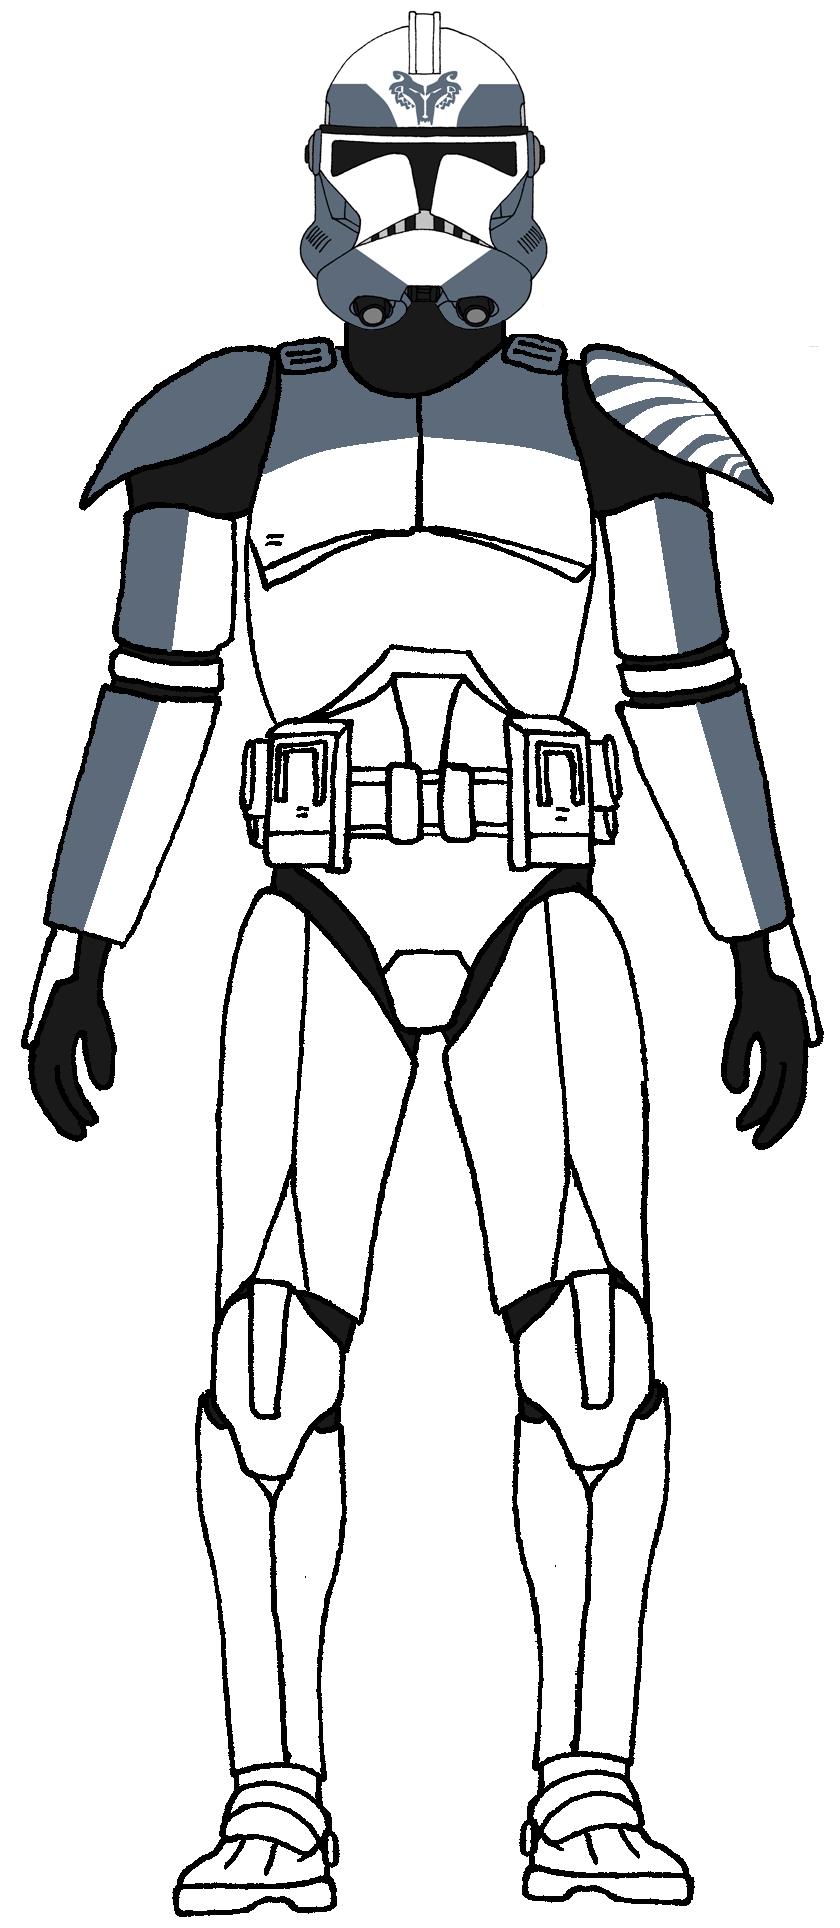 Clone Trooper Sergeant Sinker 5 Star Wars Clone Wars Star Wars Pictures Star Wars Trooper